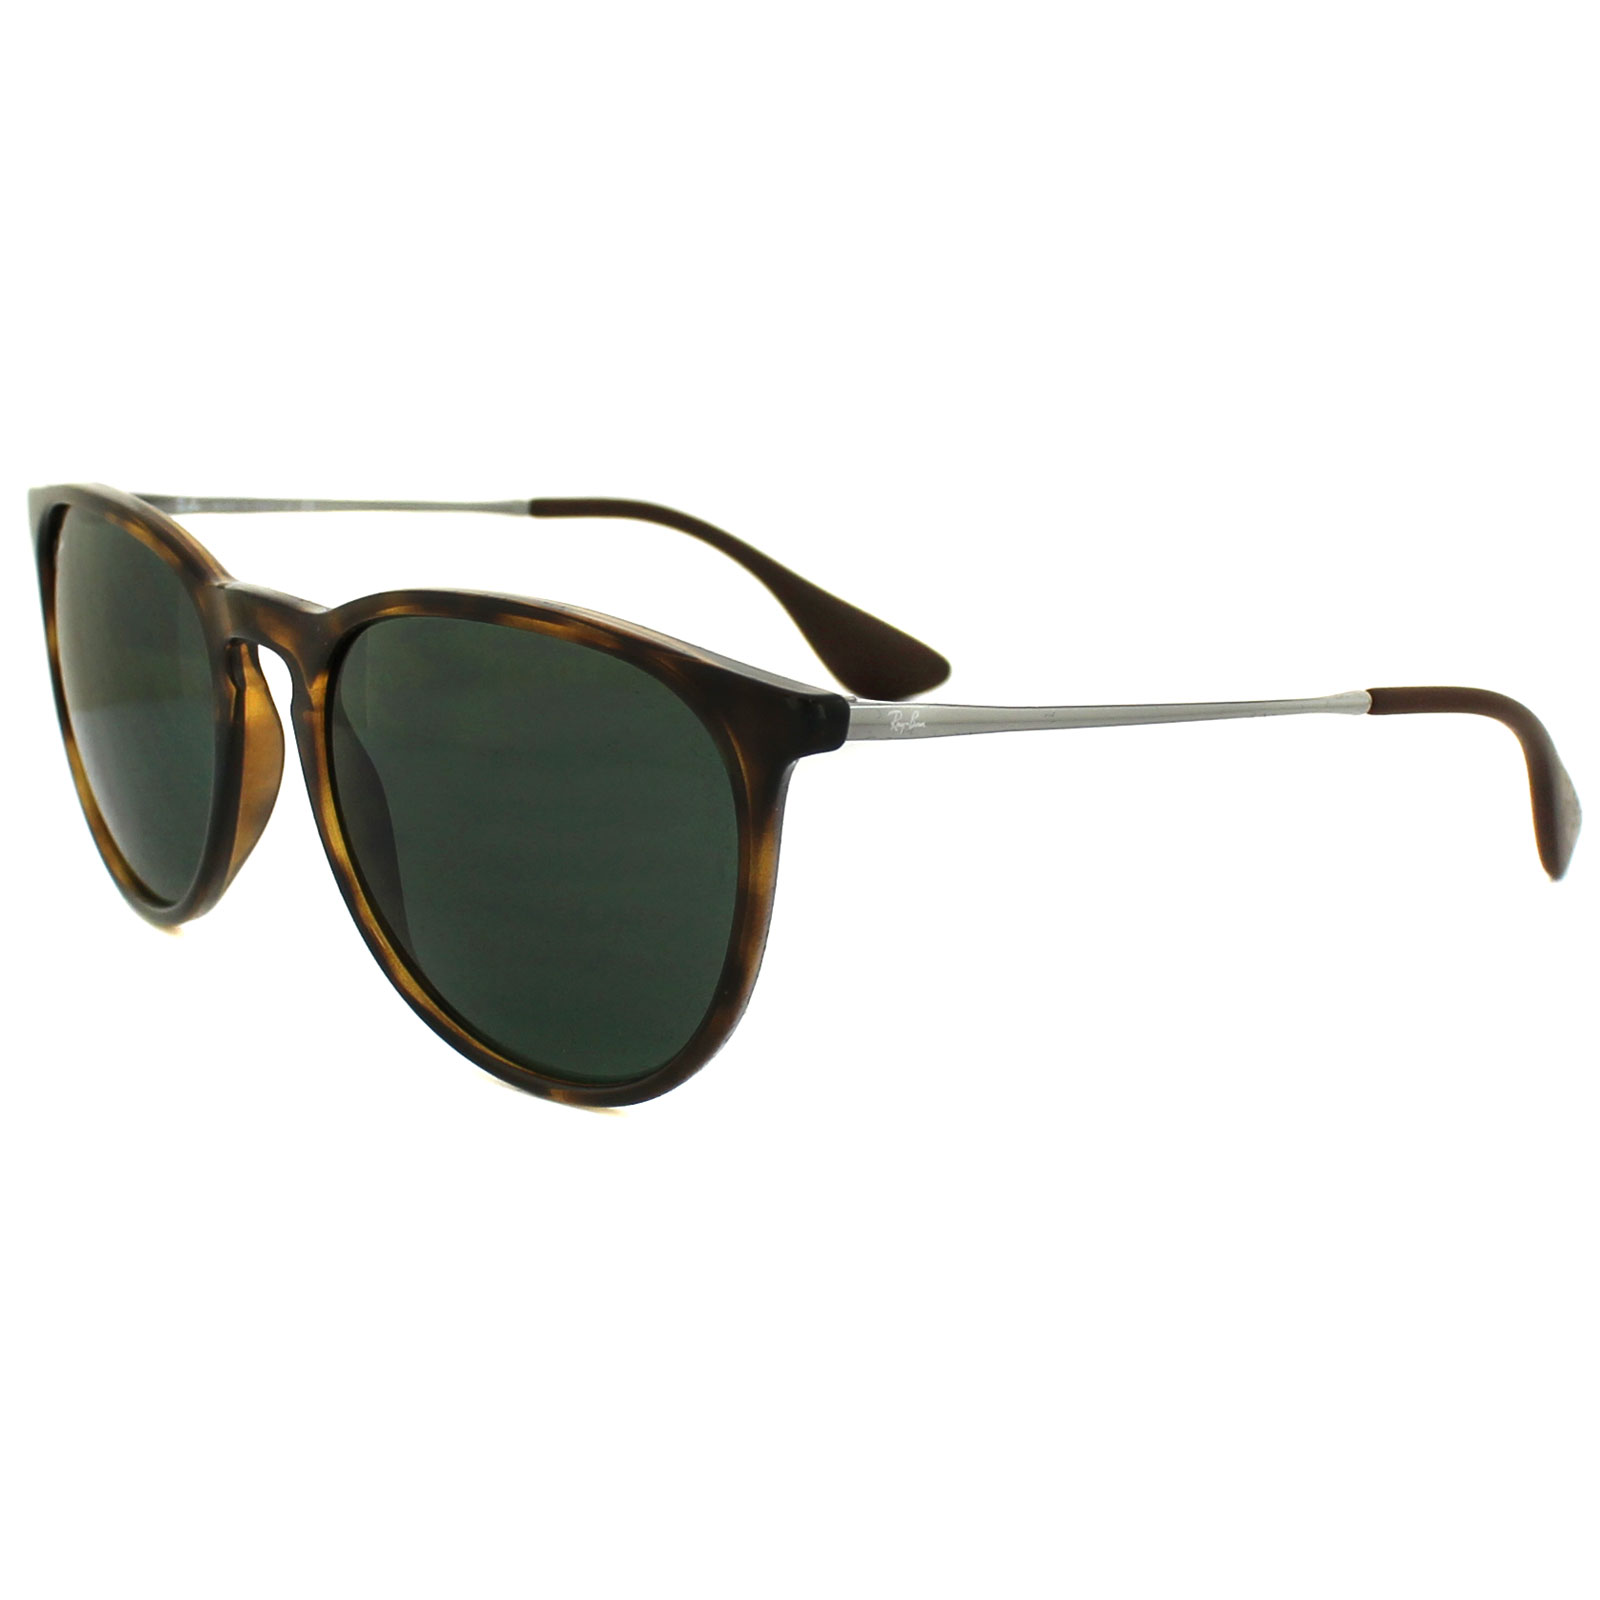 Details about Ray-Ban Sunglasses Erika 4171 710 71 Tortoise   Gunmetal Green 2102818e0bb8